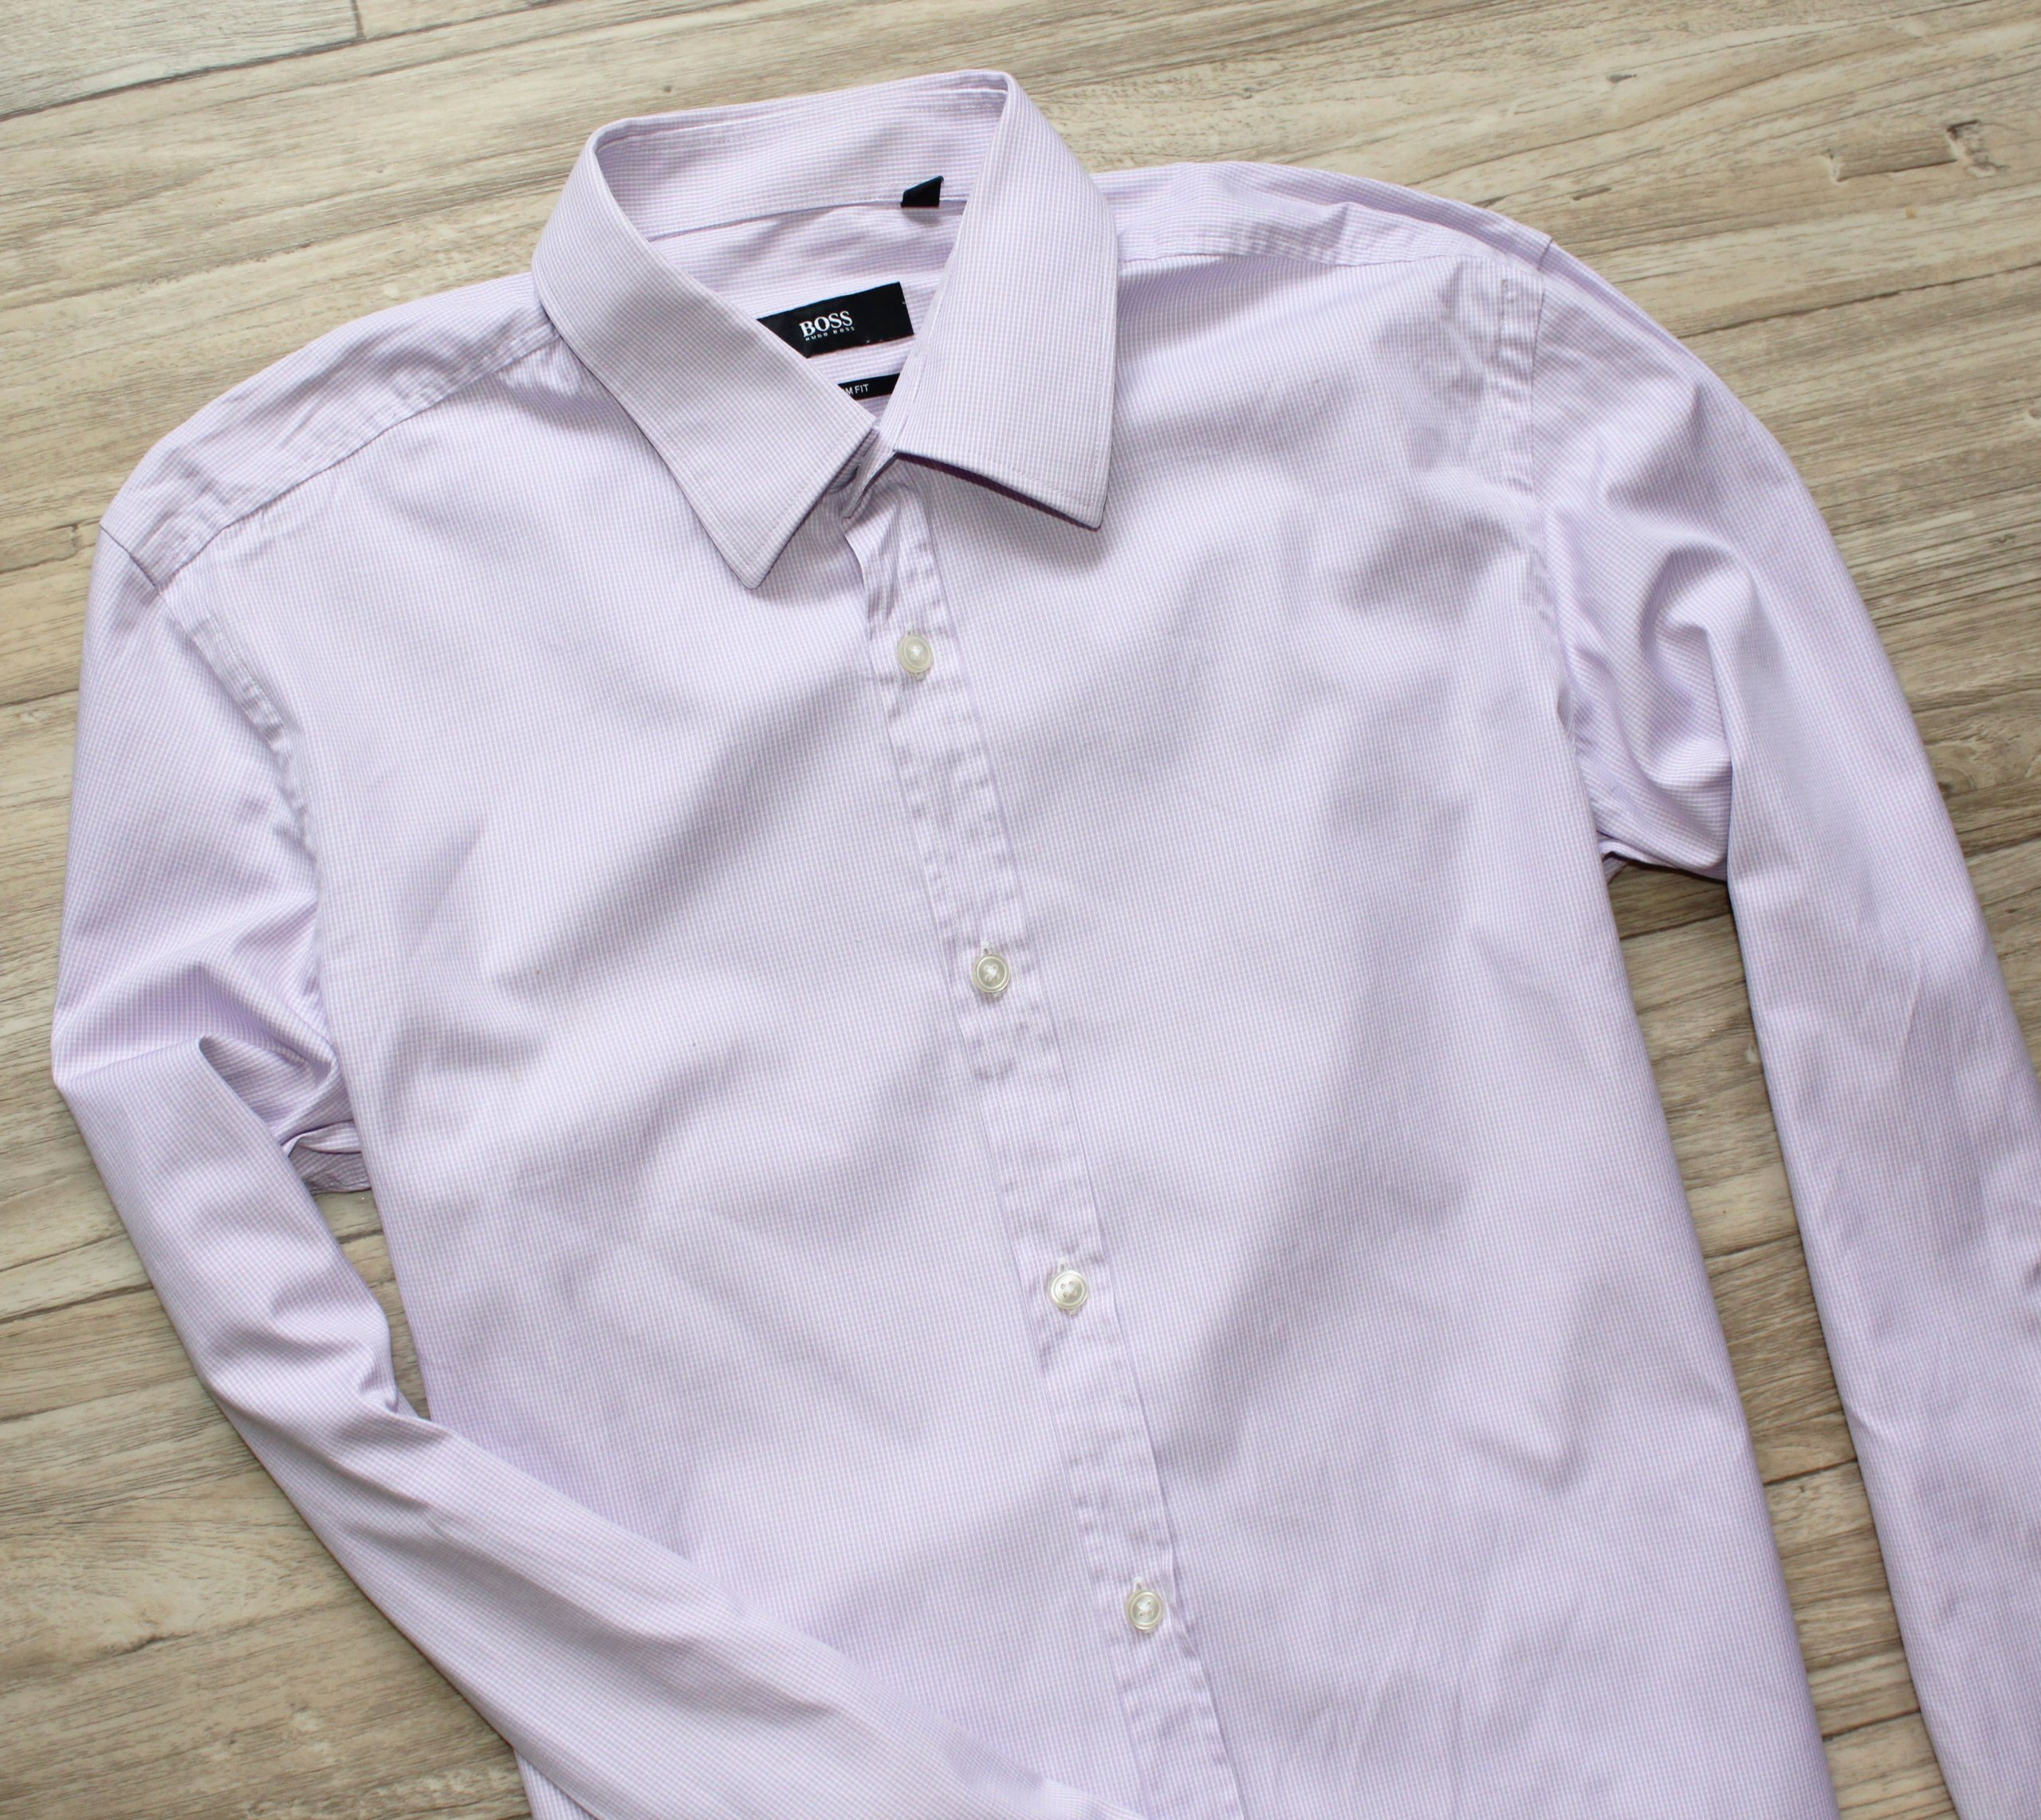 a6151ca41404d Koszula Hugo Boss 38 M slim fit oryginał - 7138147537 - oficjalne ...